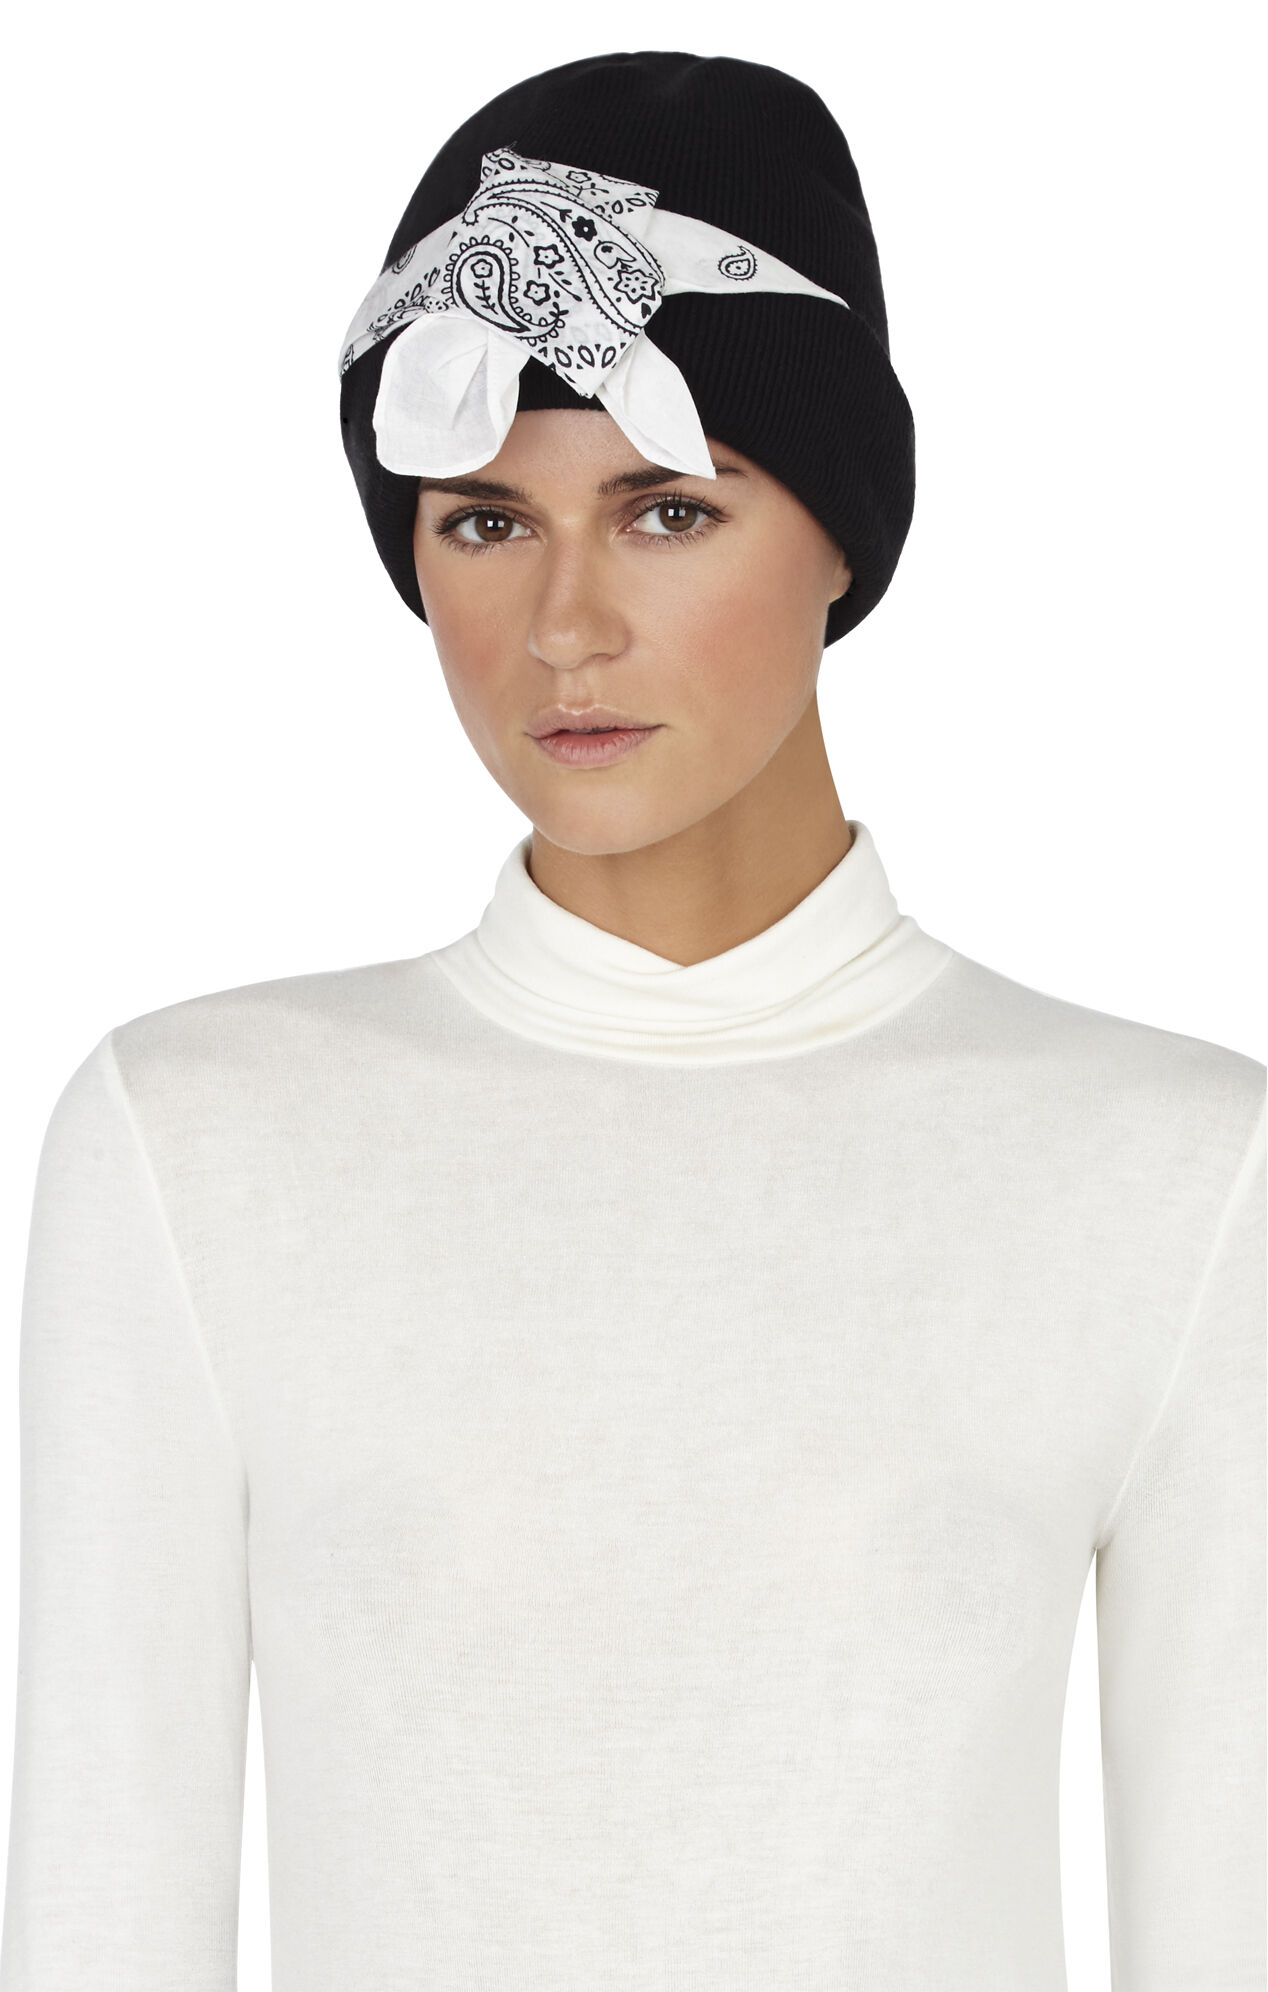 Cuffed Bandana Hat